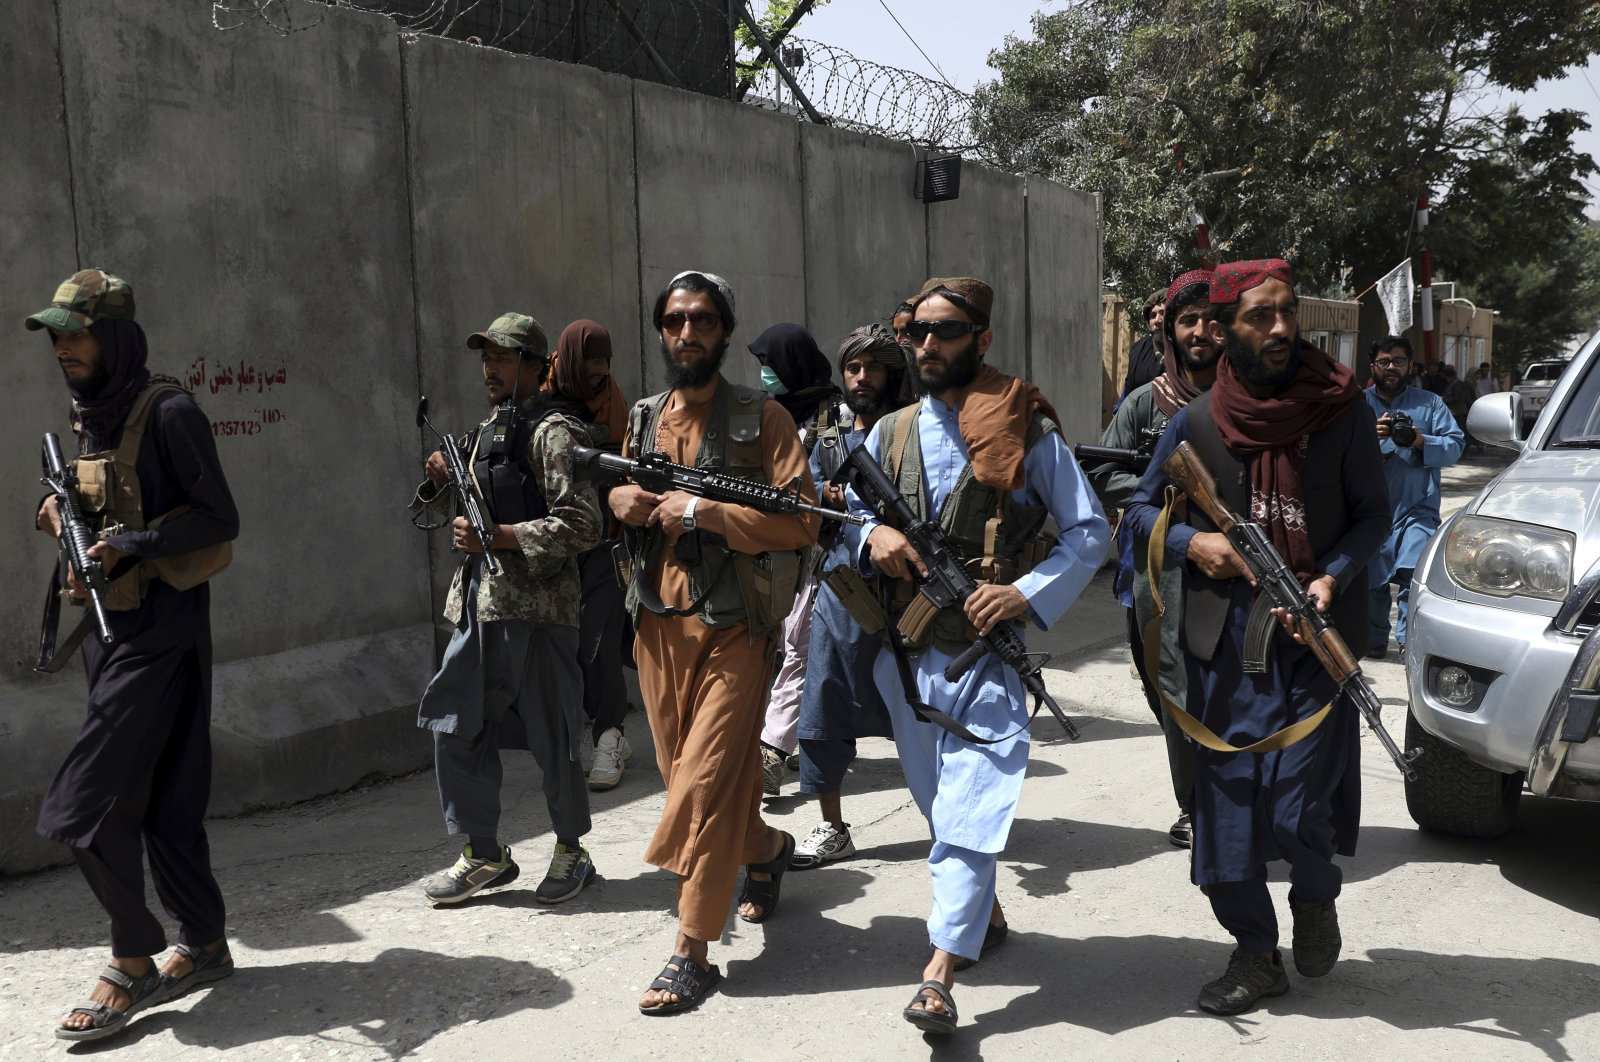 Taliban fighters patrol in Wazir Akbar Khan neighborhood in the city of Kabul, Afghanistan, Wednesday, Aug. 18, 2021. (Rahmat Gul via AP Photo)